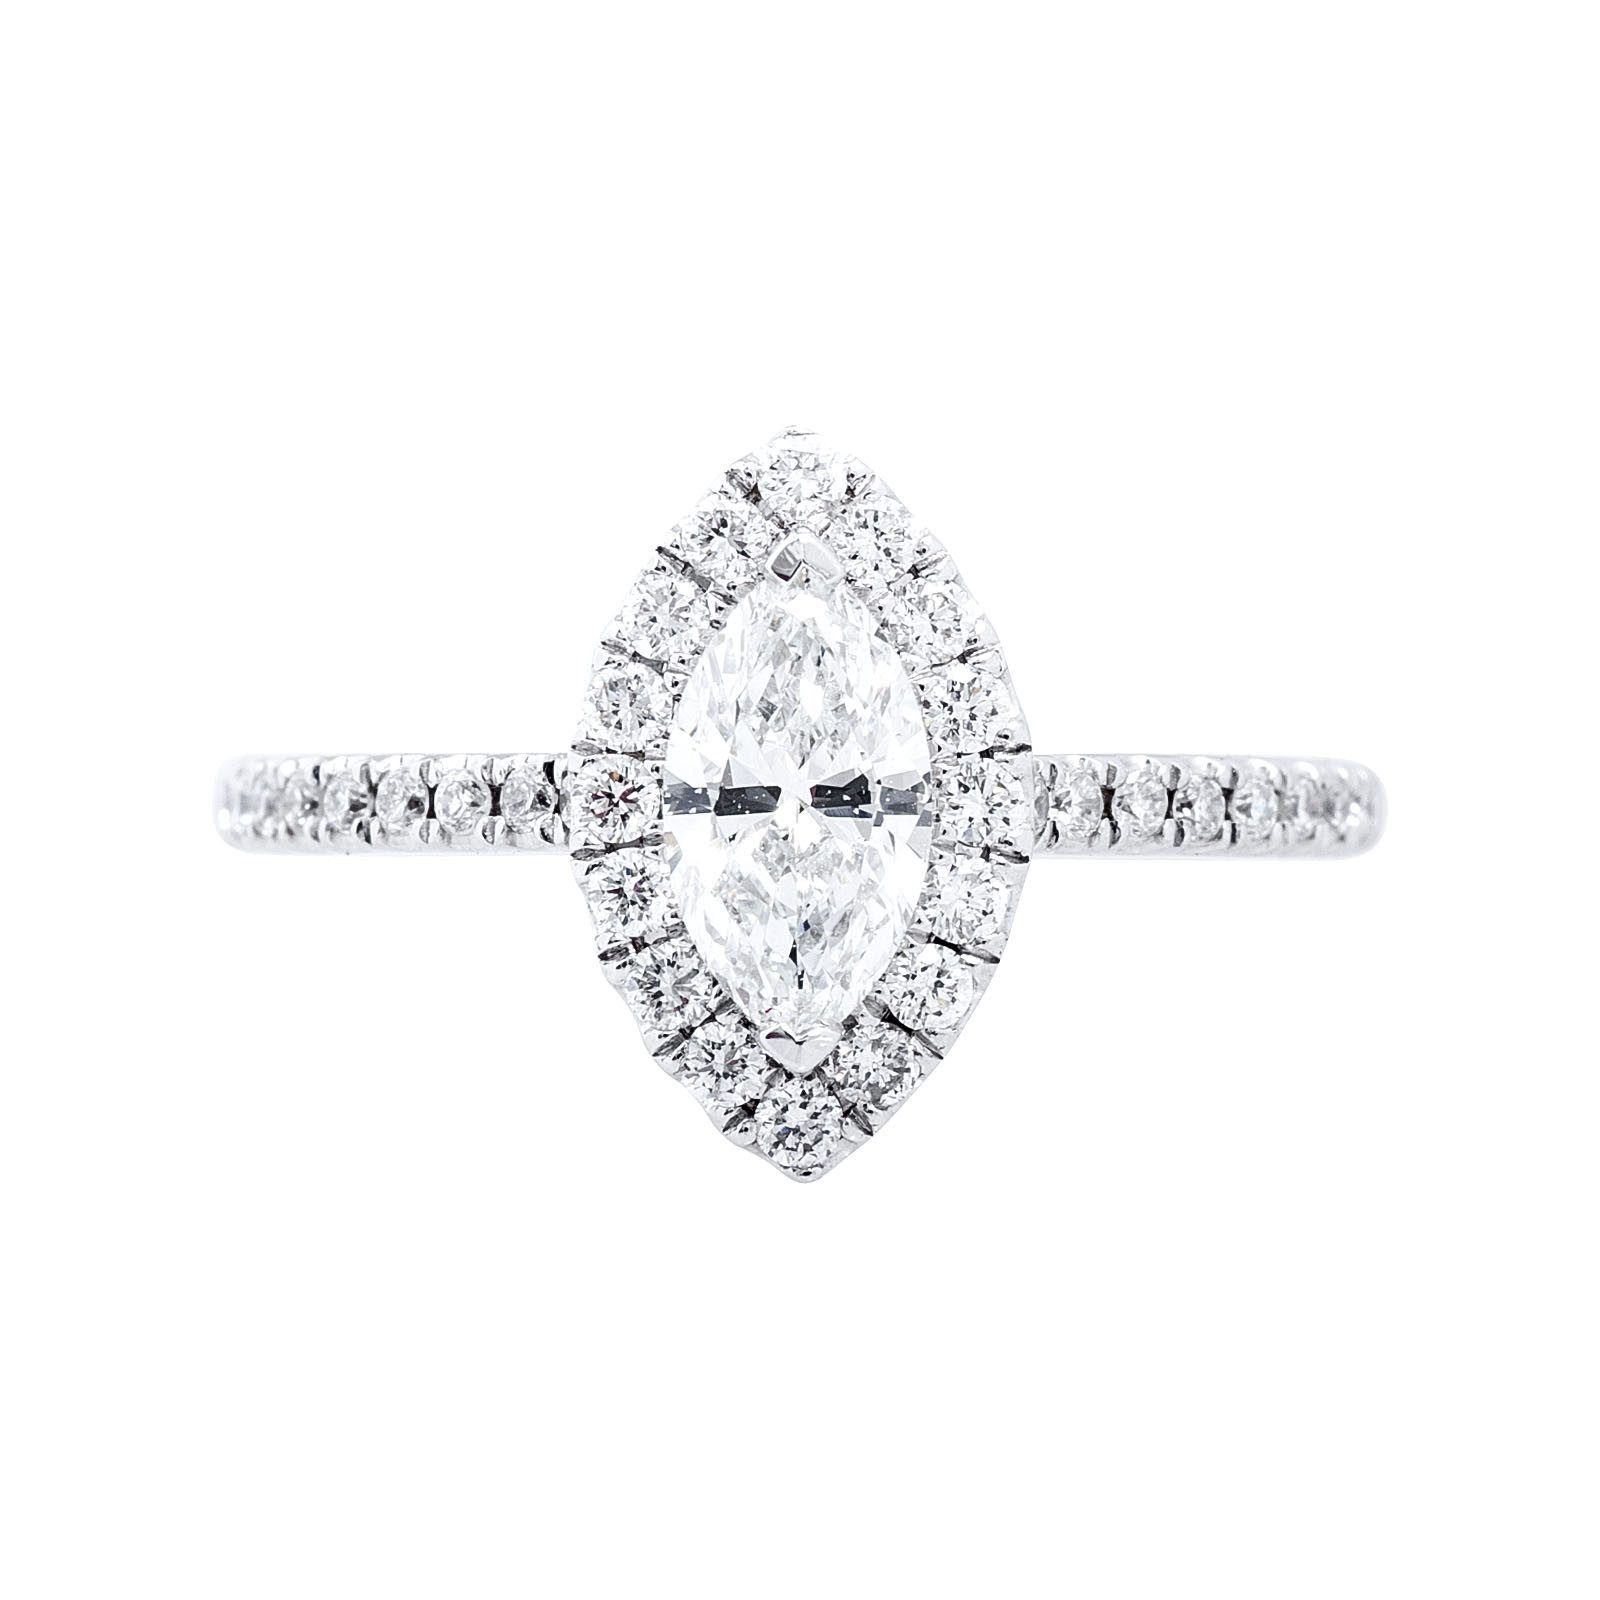 New 1.03 CTW Diamond Engagement Ring